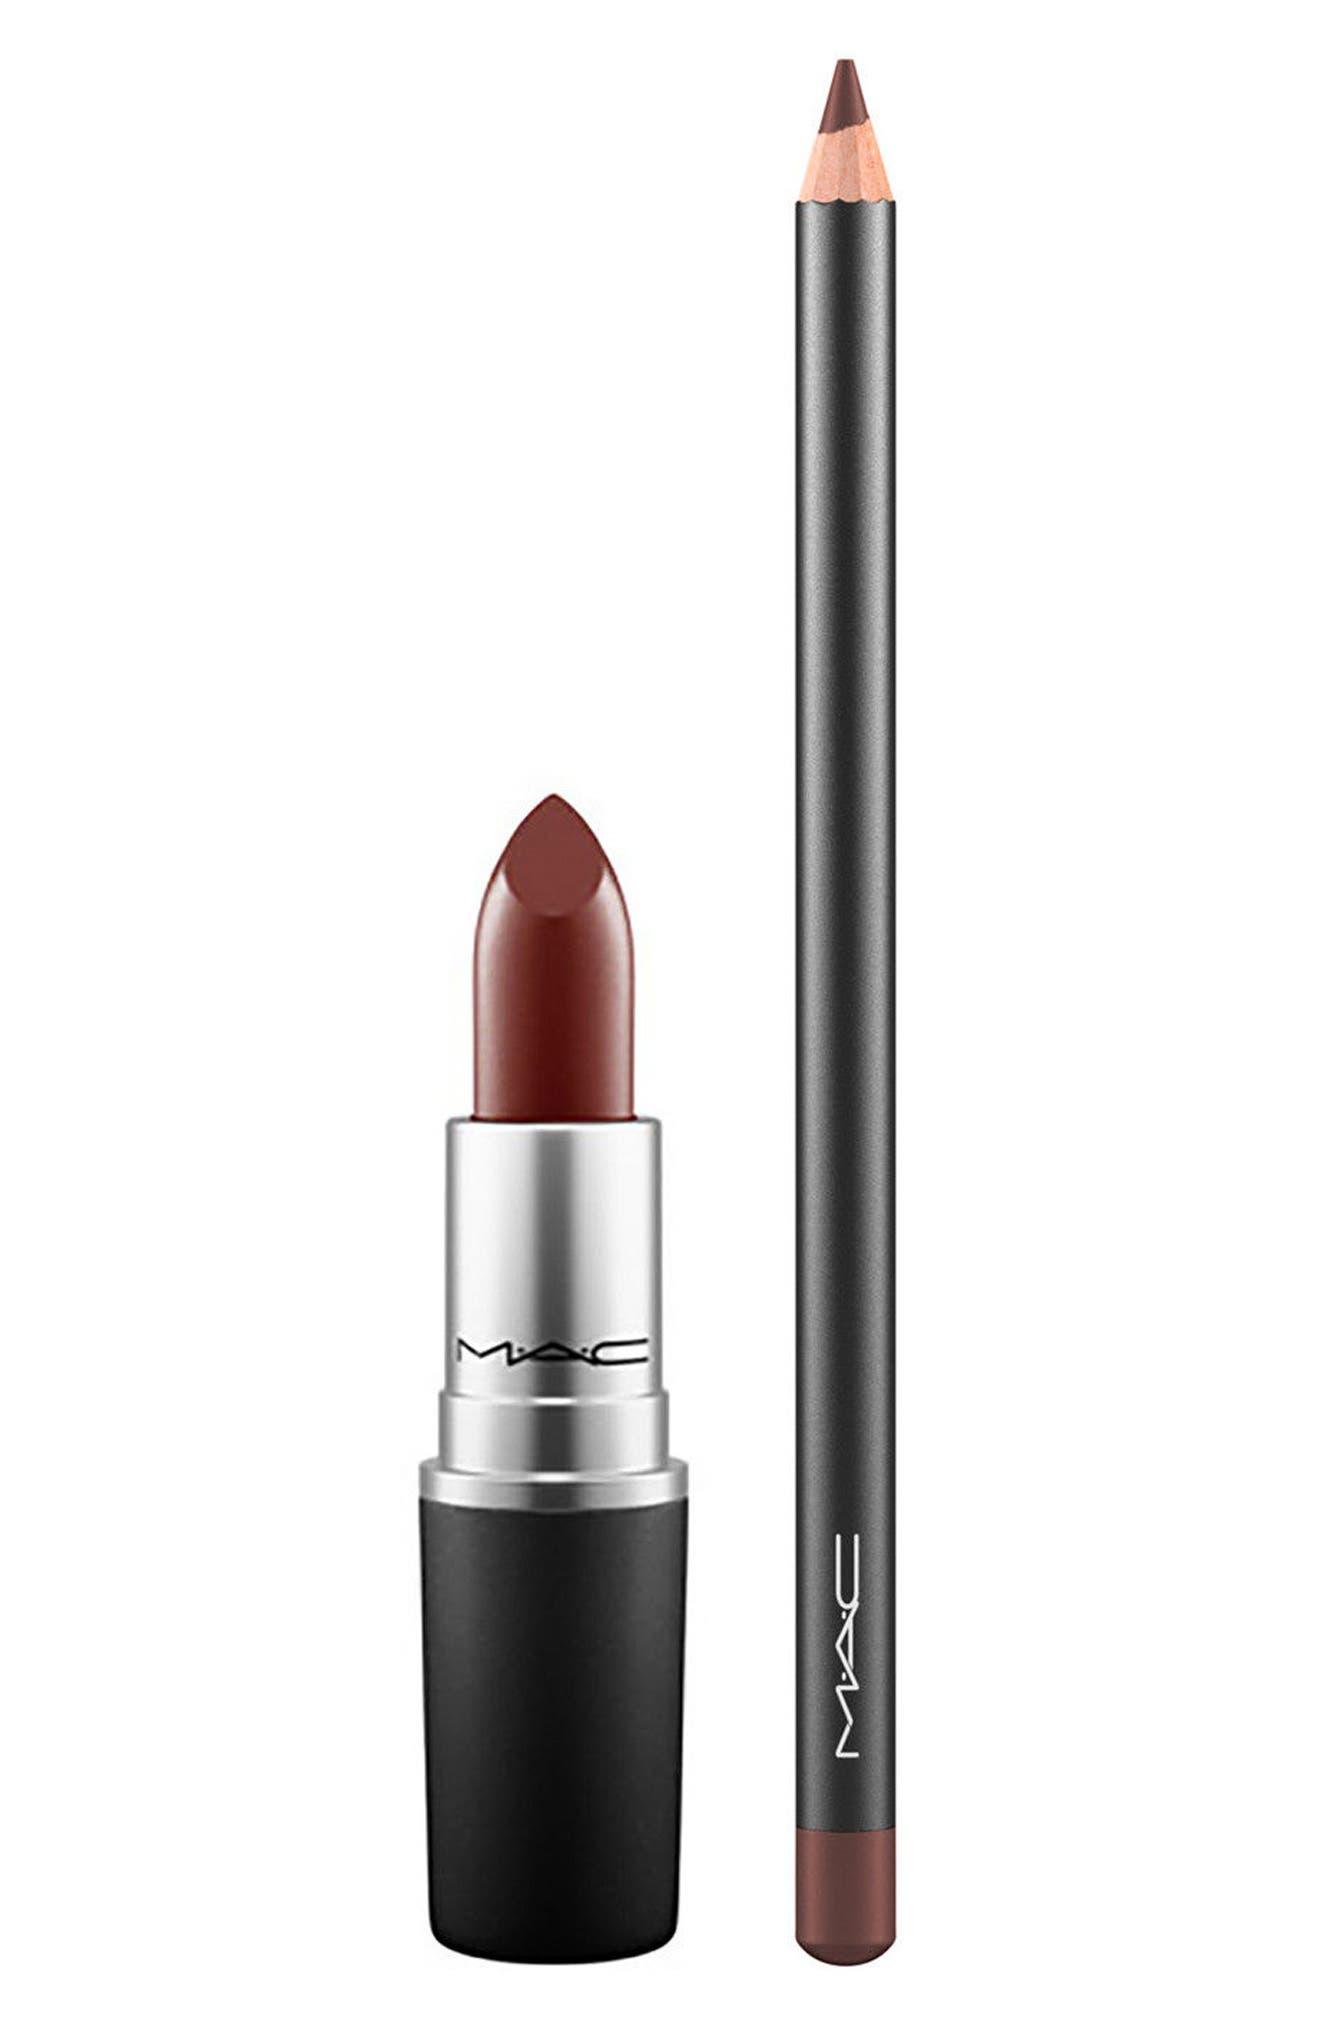 MAC Lip Duo ($34.50 Value)